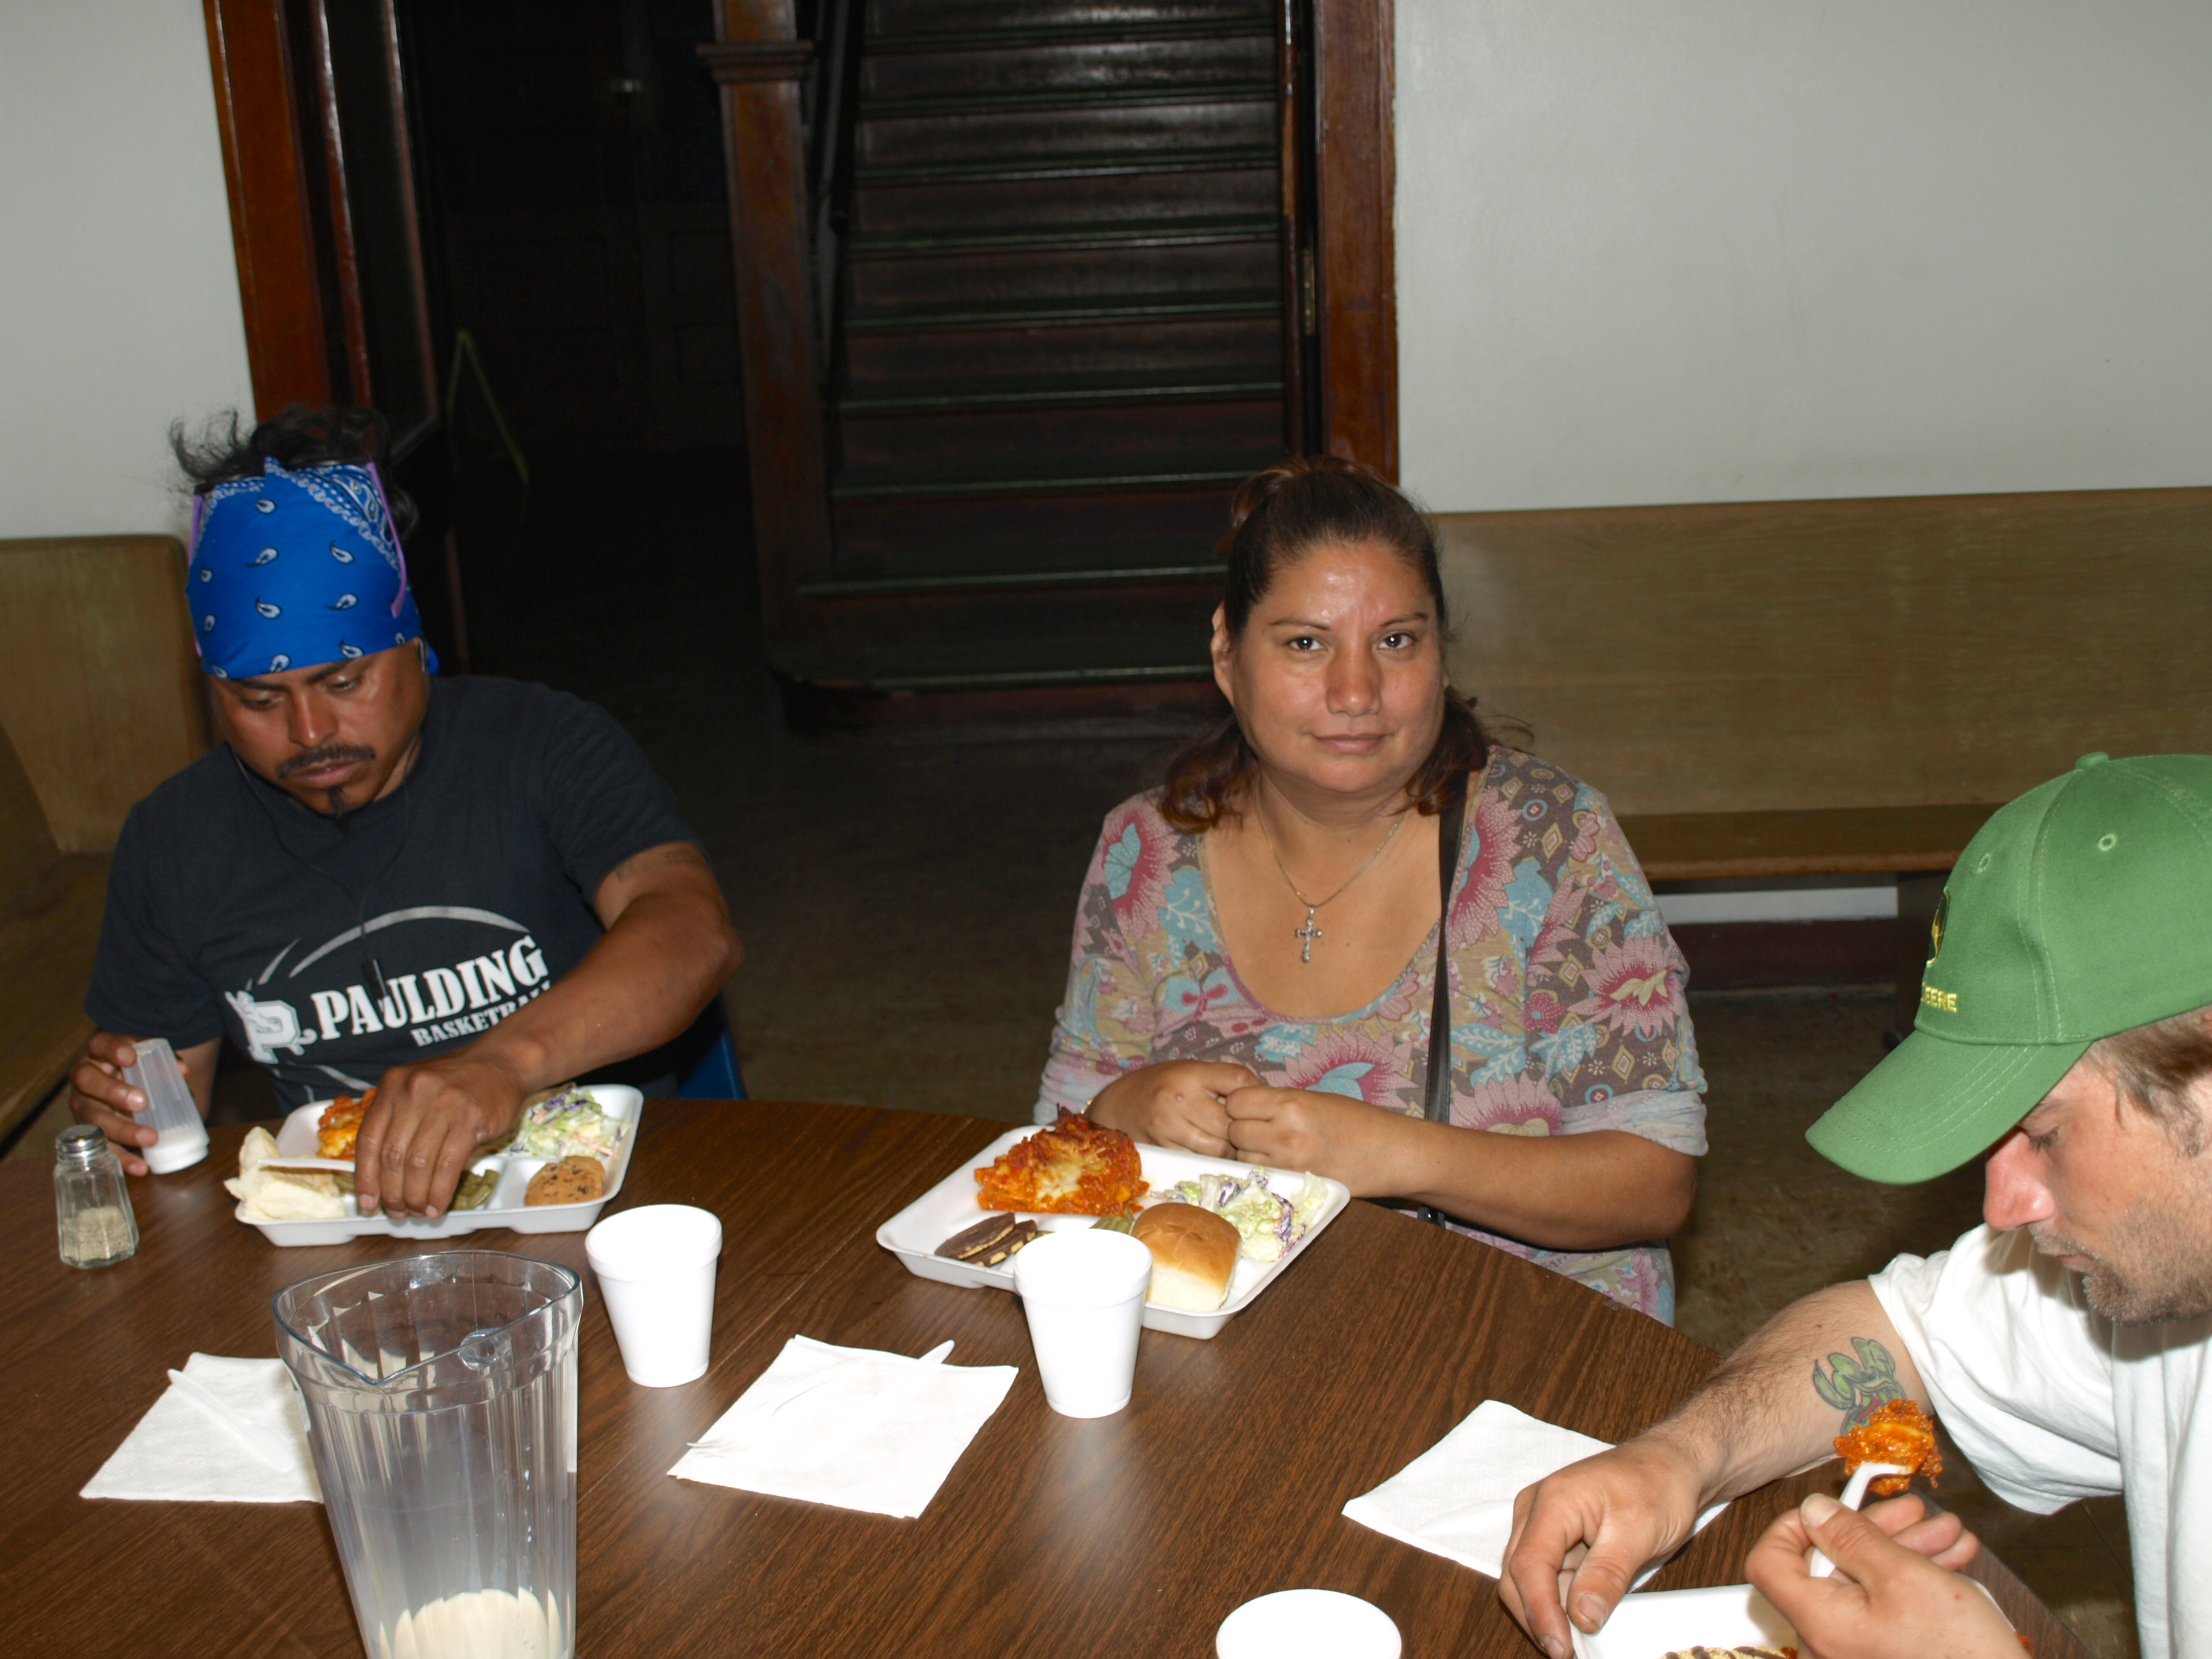 SD Hispanic woman 2015.jpg